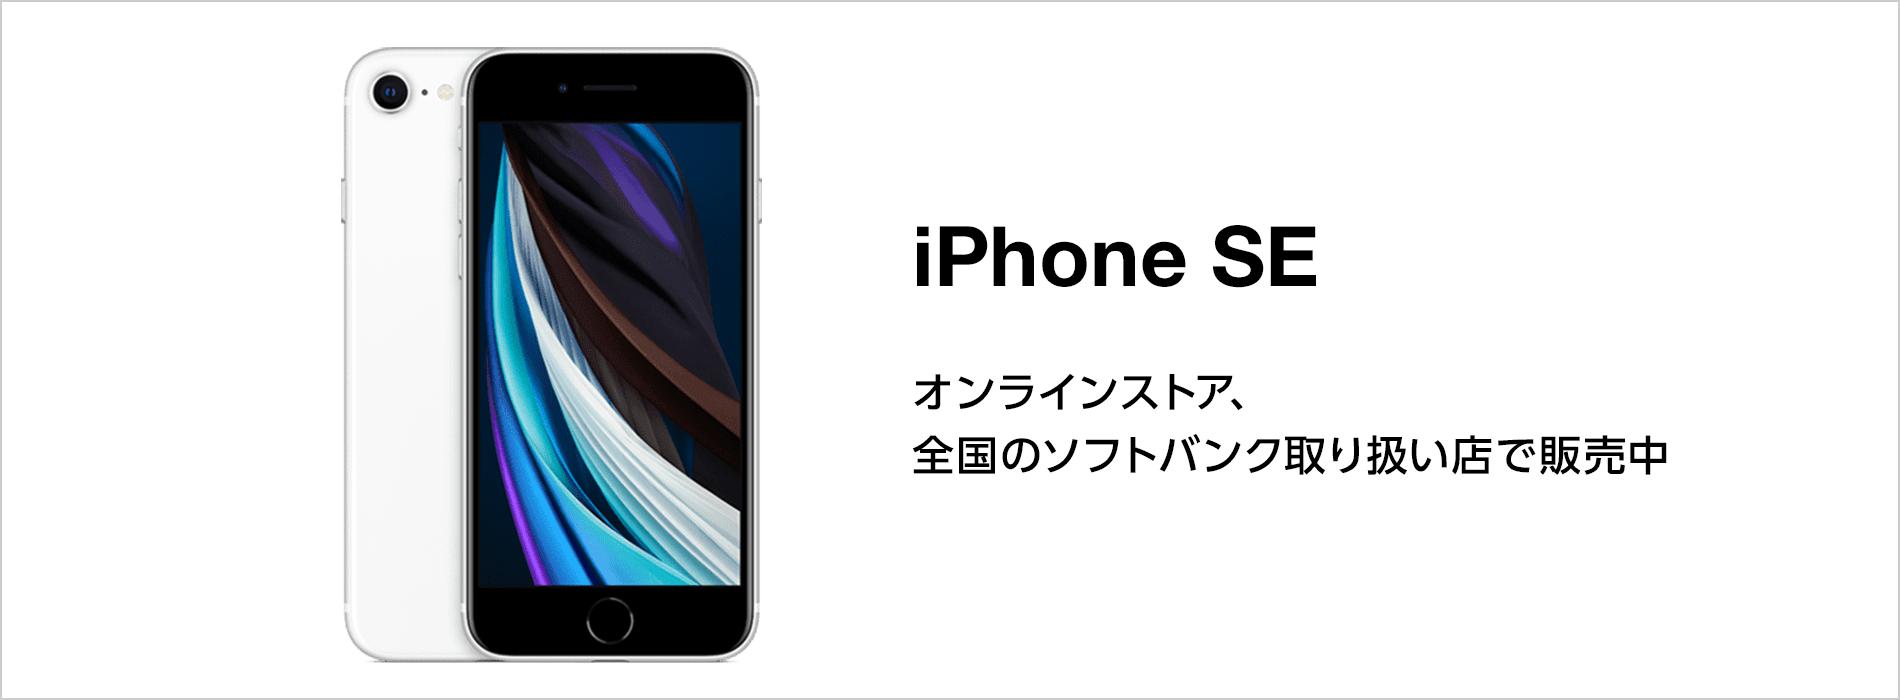 iPhone SE オンラインストア、全国のソフトバンク取り扱い店で販売中